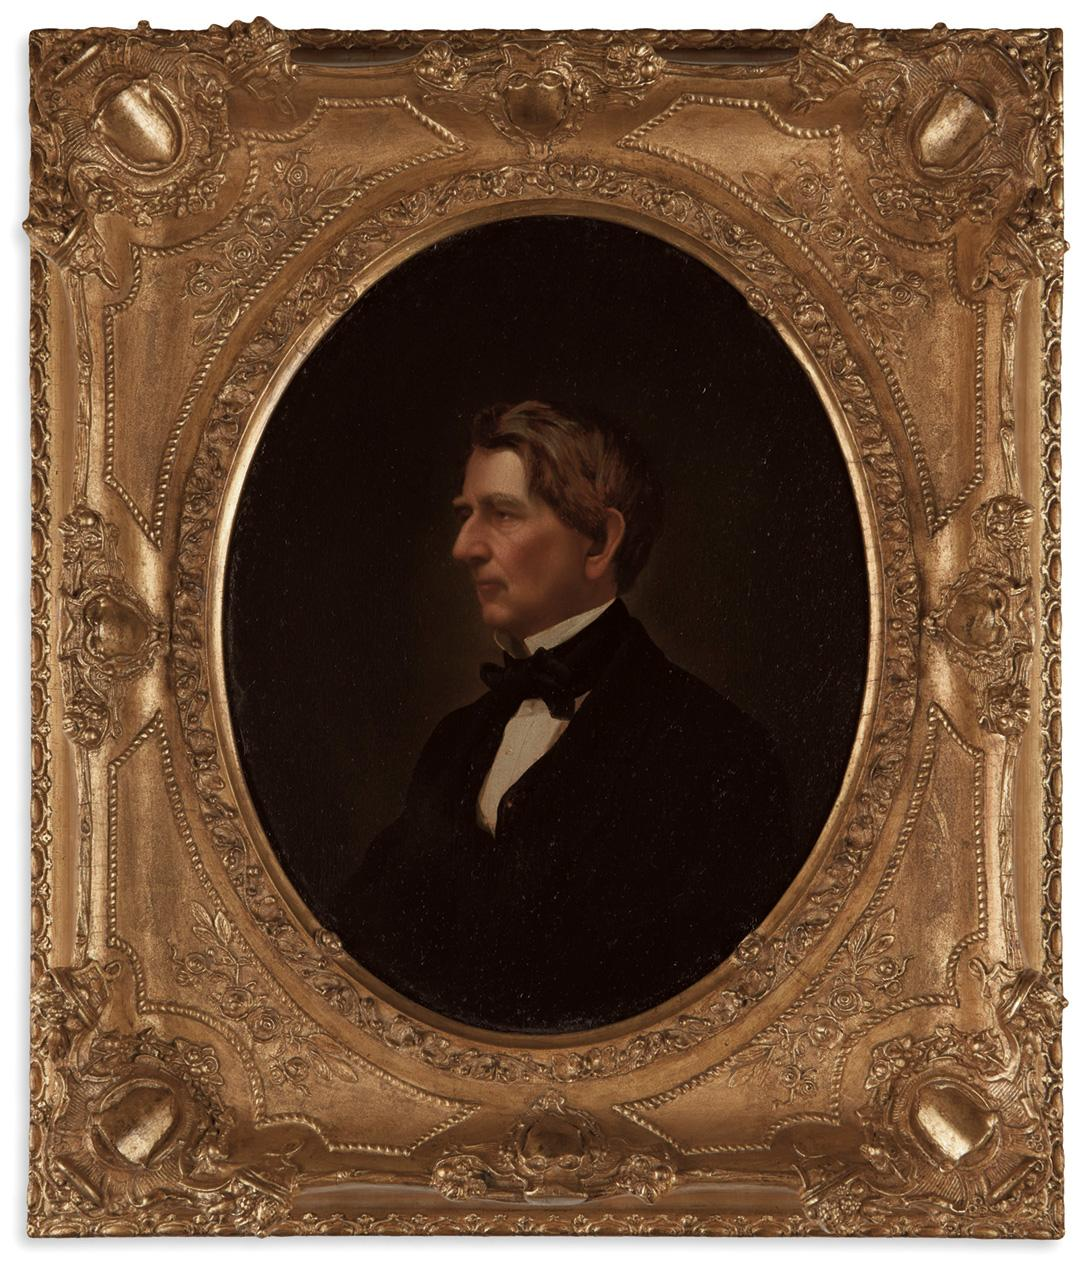 18 x 24 1801-1872 Namerican Statesman Oil Over A Photograph Taken By Mathew B Brady During The Civil War Poster Print by William Seward